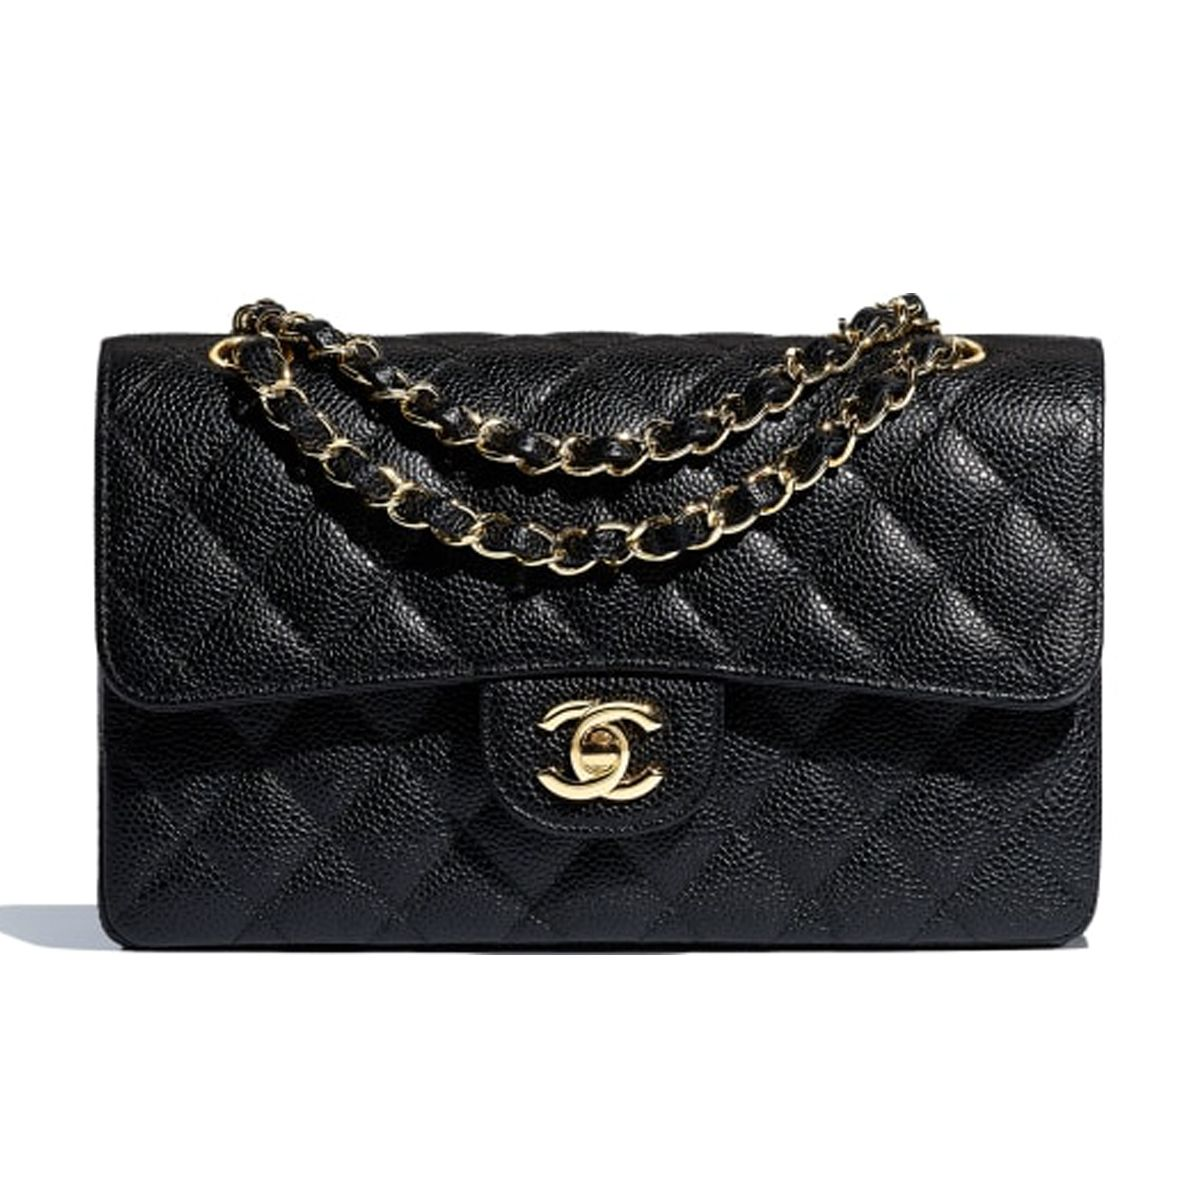 classic-designer-handbag-brands-271996-1541601213807-product.1200x0c.jpg (1200×1200)